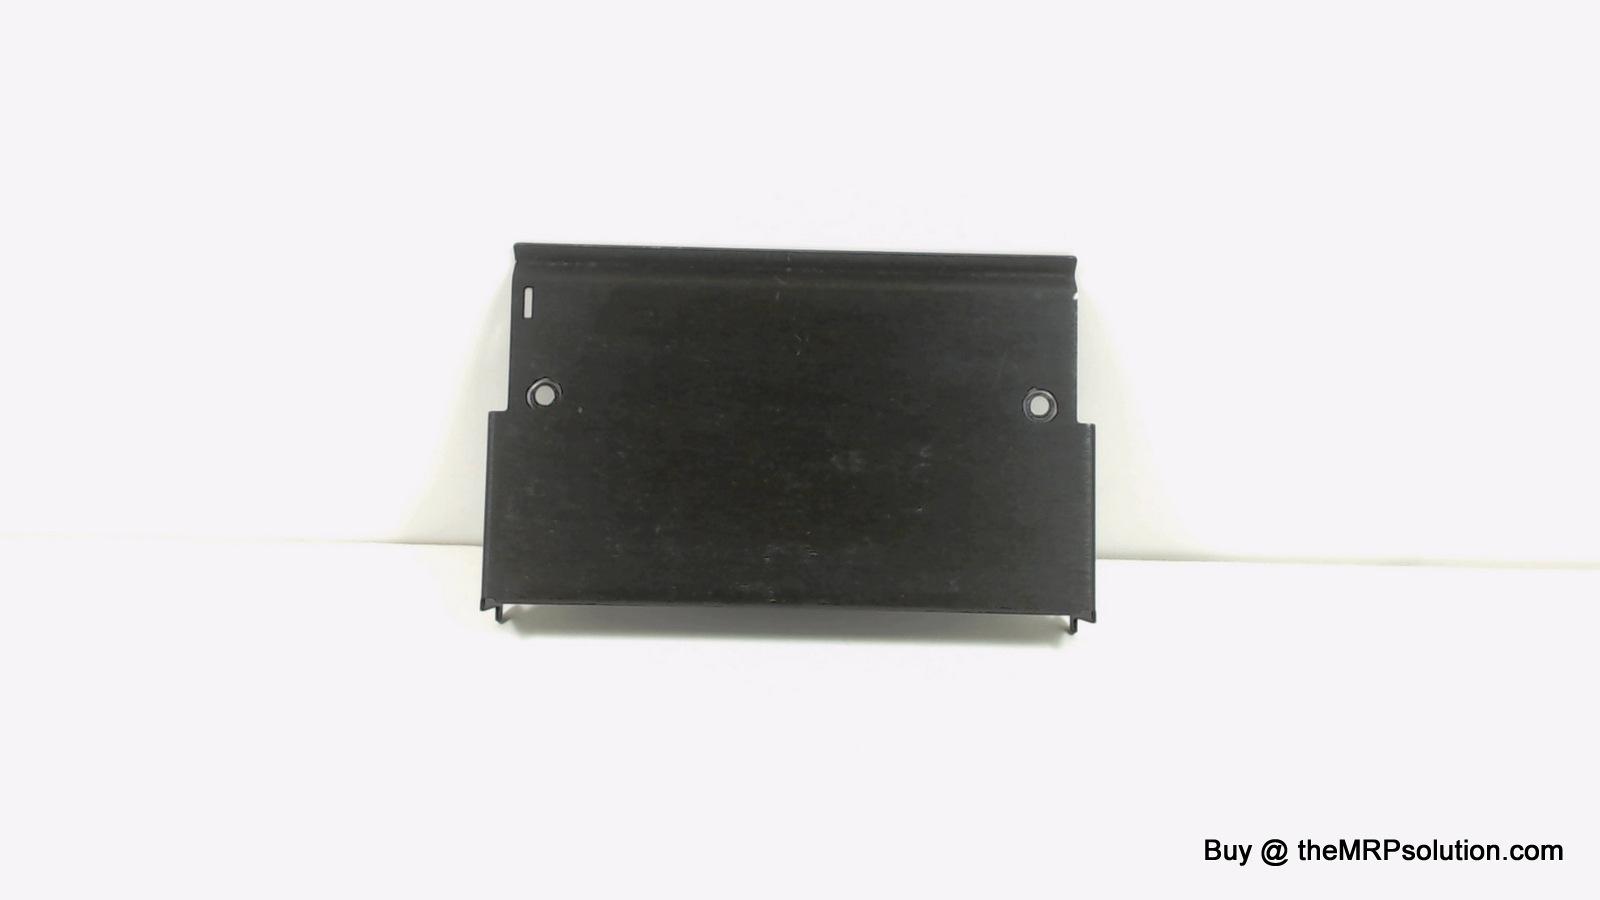 ZEBRA 44282 TEAR-OFF PLATE, S400/S500 Refurbished